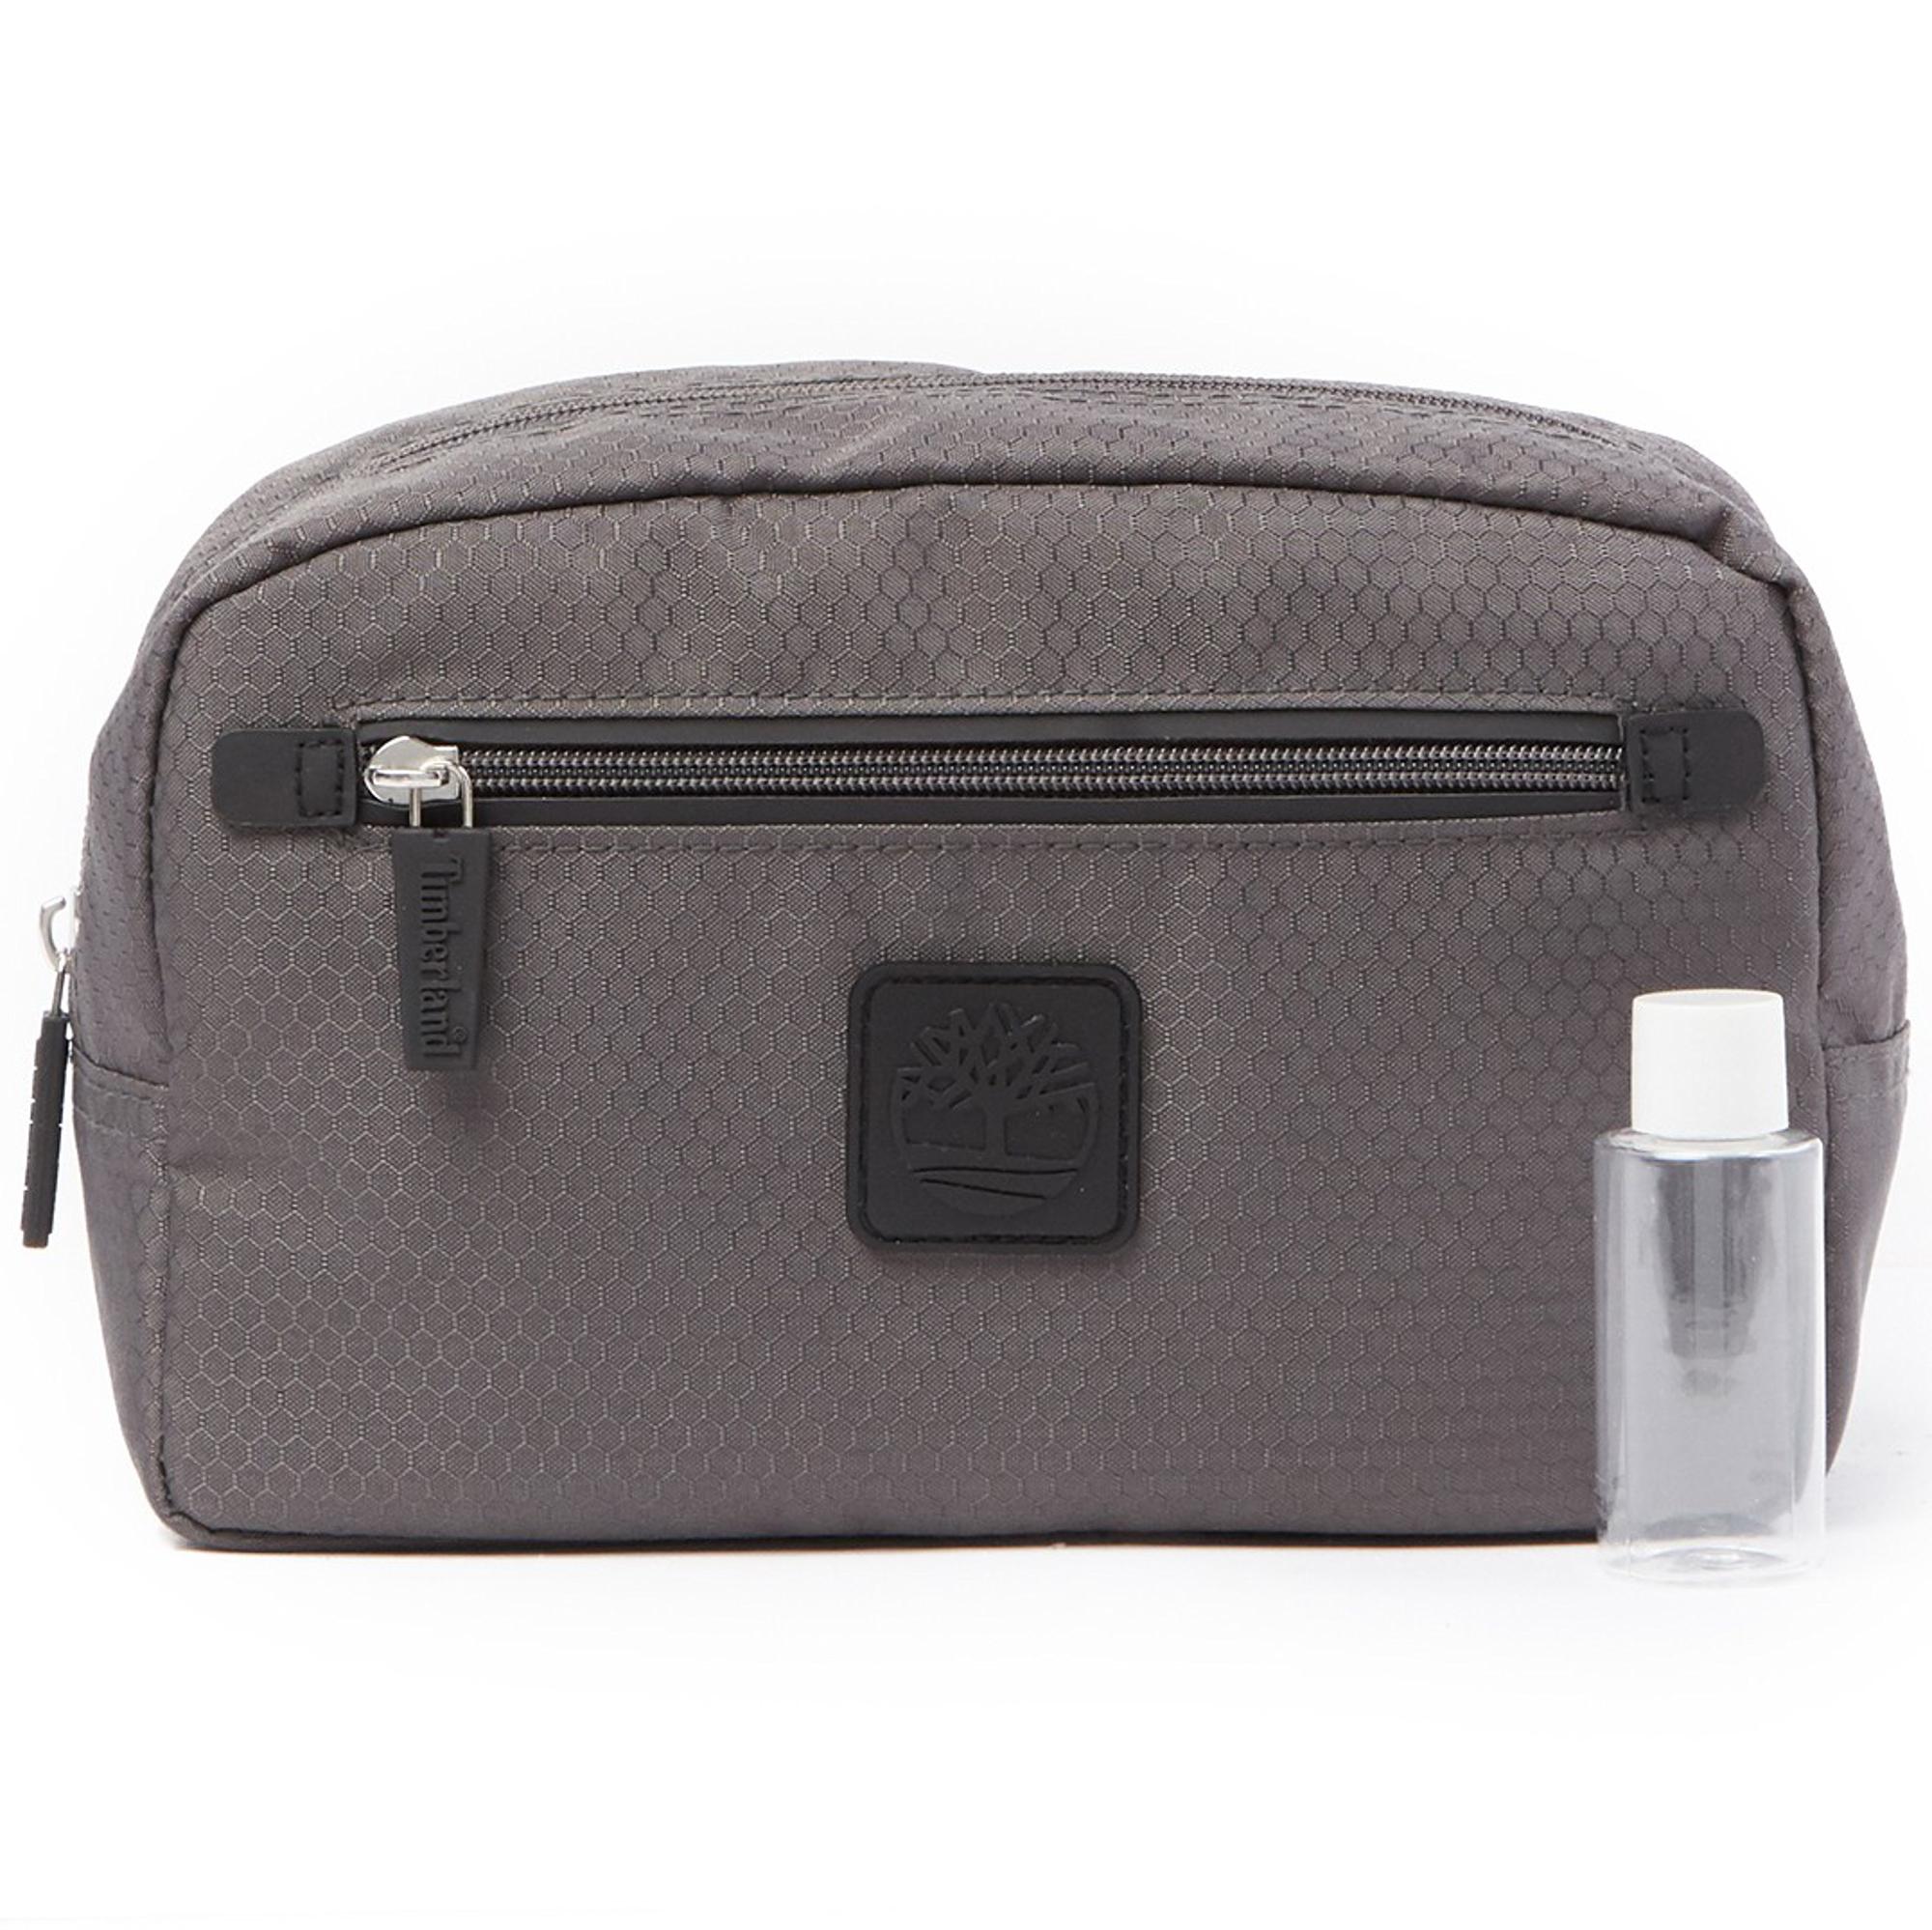 Timberland Mens Shave Kit Organizer Travel Dopp Kit Overnight Toiletry Bag